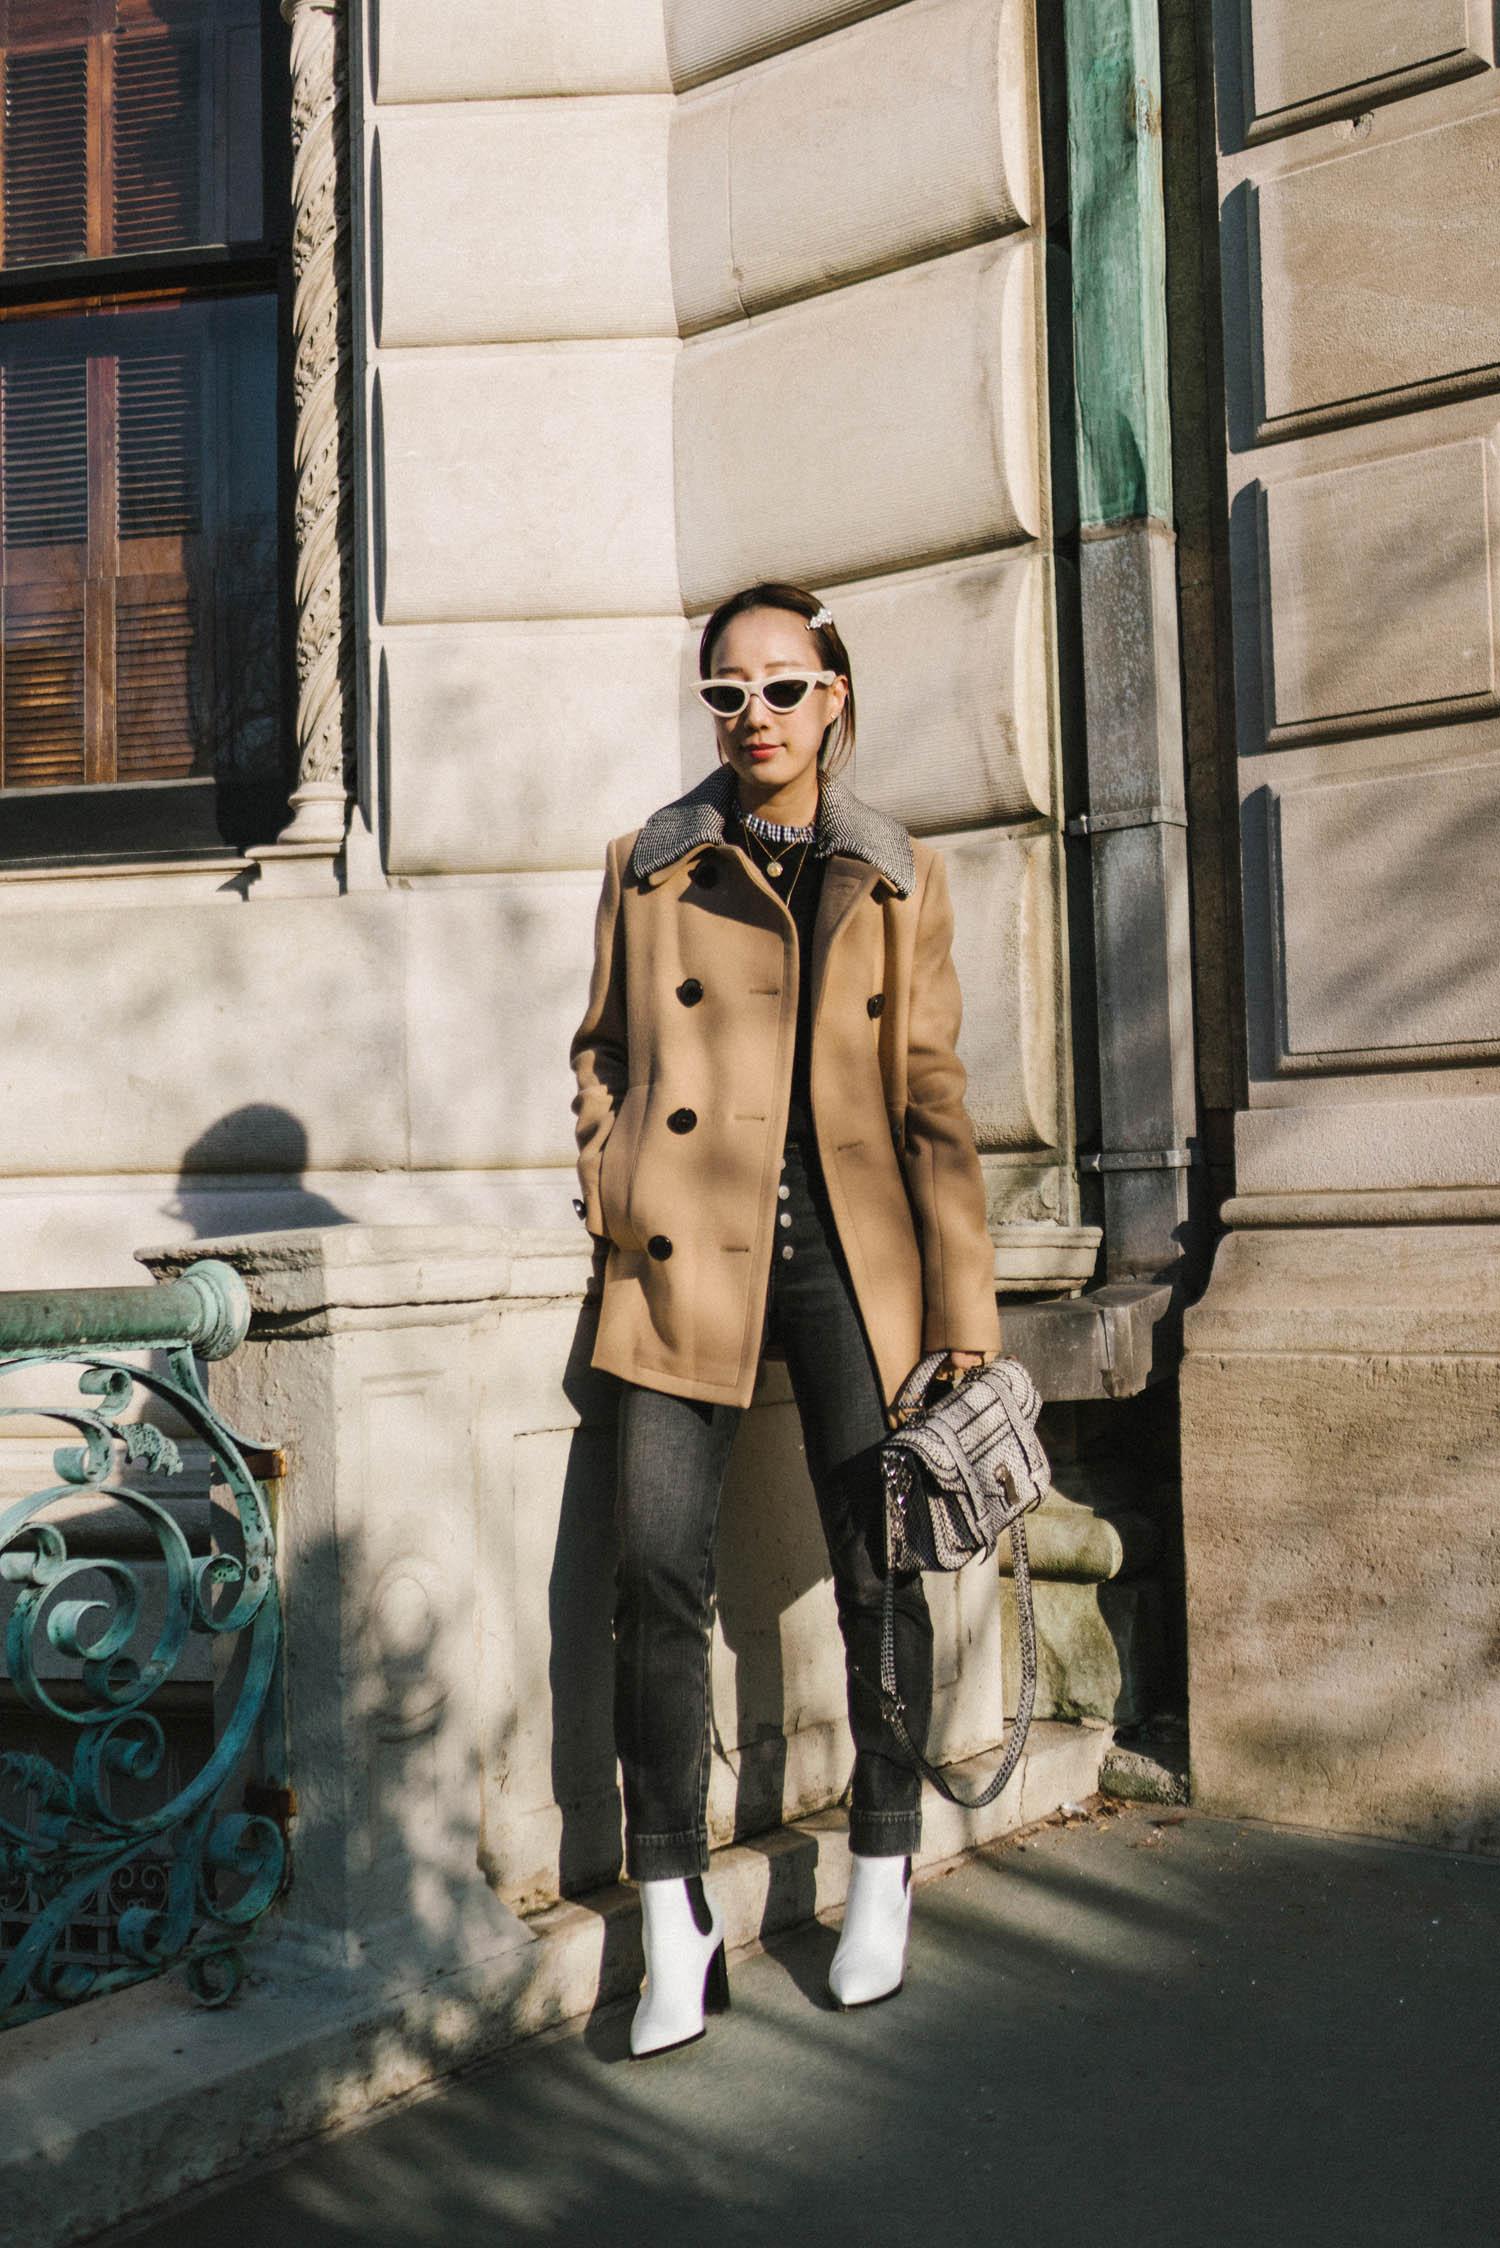 Proenza Schouler Coat,  Trave Denim , Proenza Schouler Bag,  Gianvito Rossi Boots ,  Celine Sunglasses , Simone Rocha Hair Clip